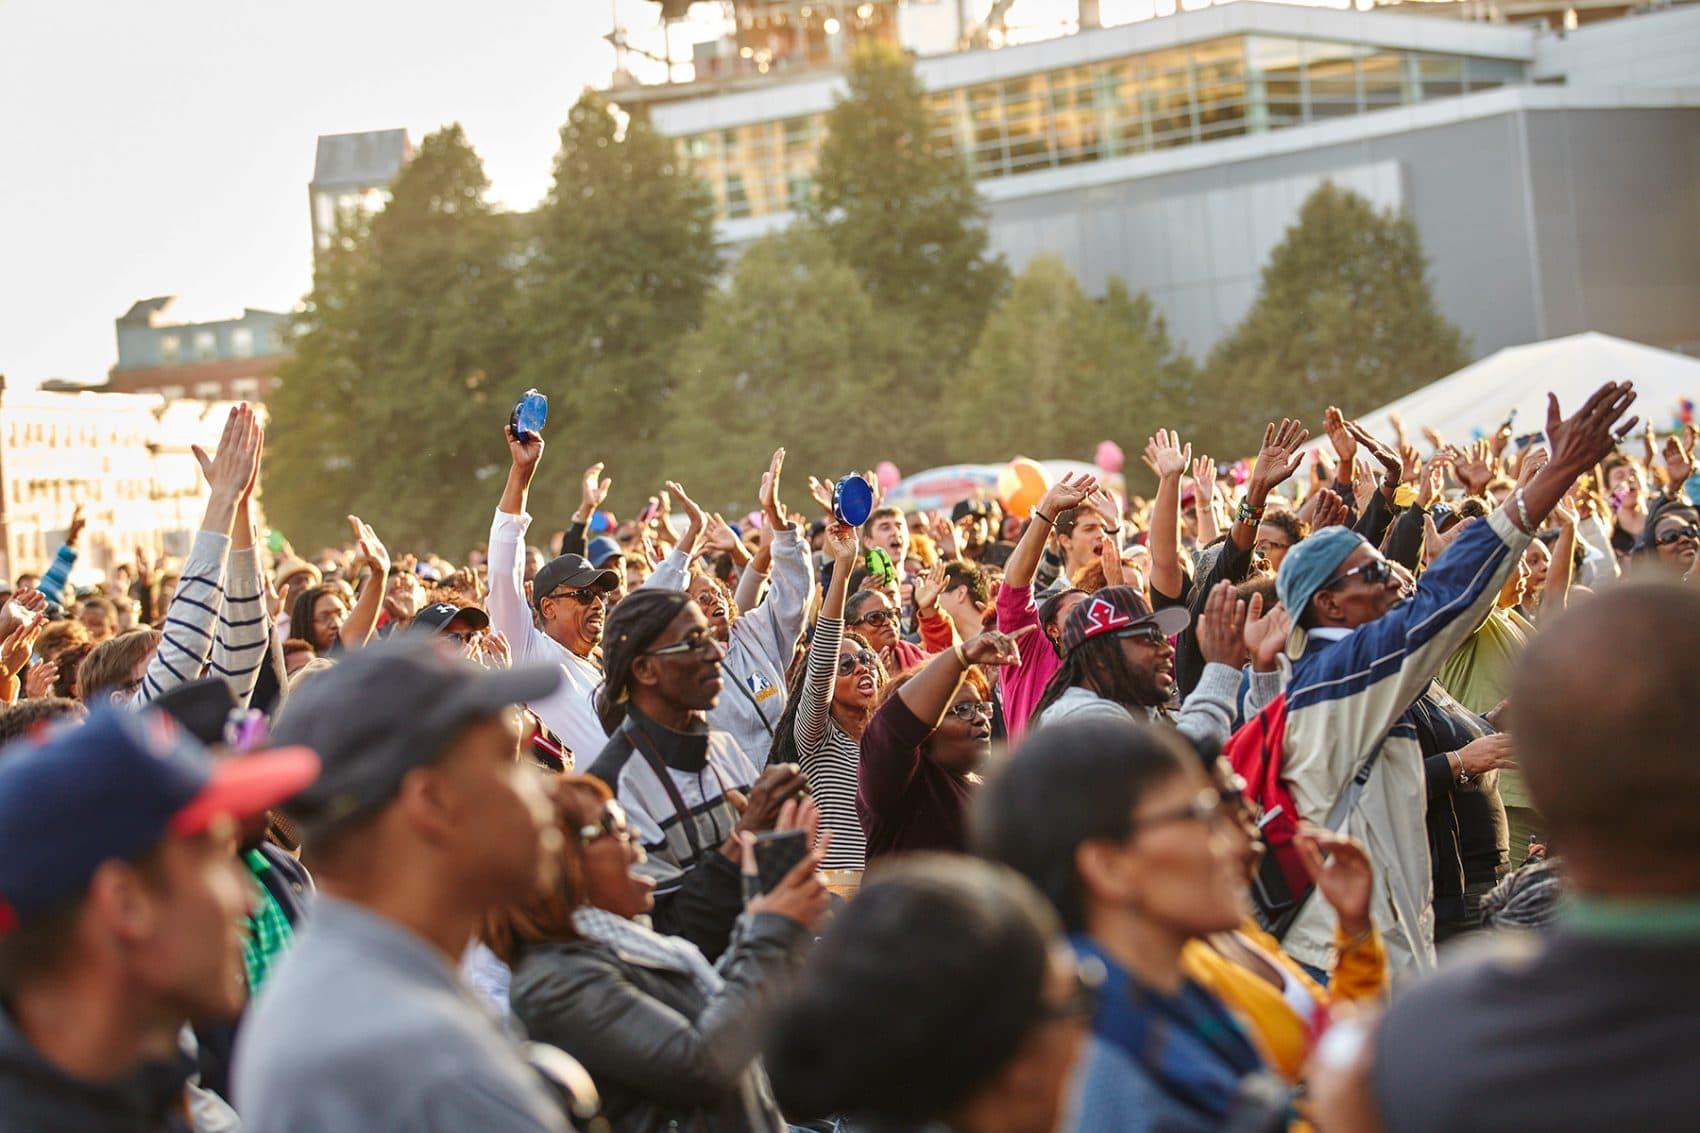 The crowd in 2016 at the Berklee Beantown Jazz Festival. (Courtesy Berklee)